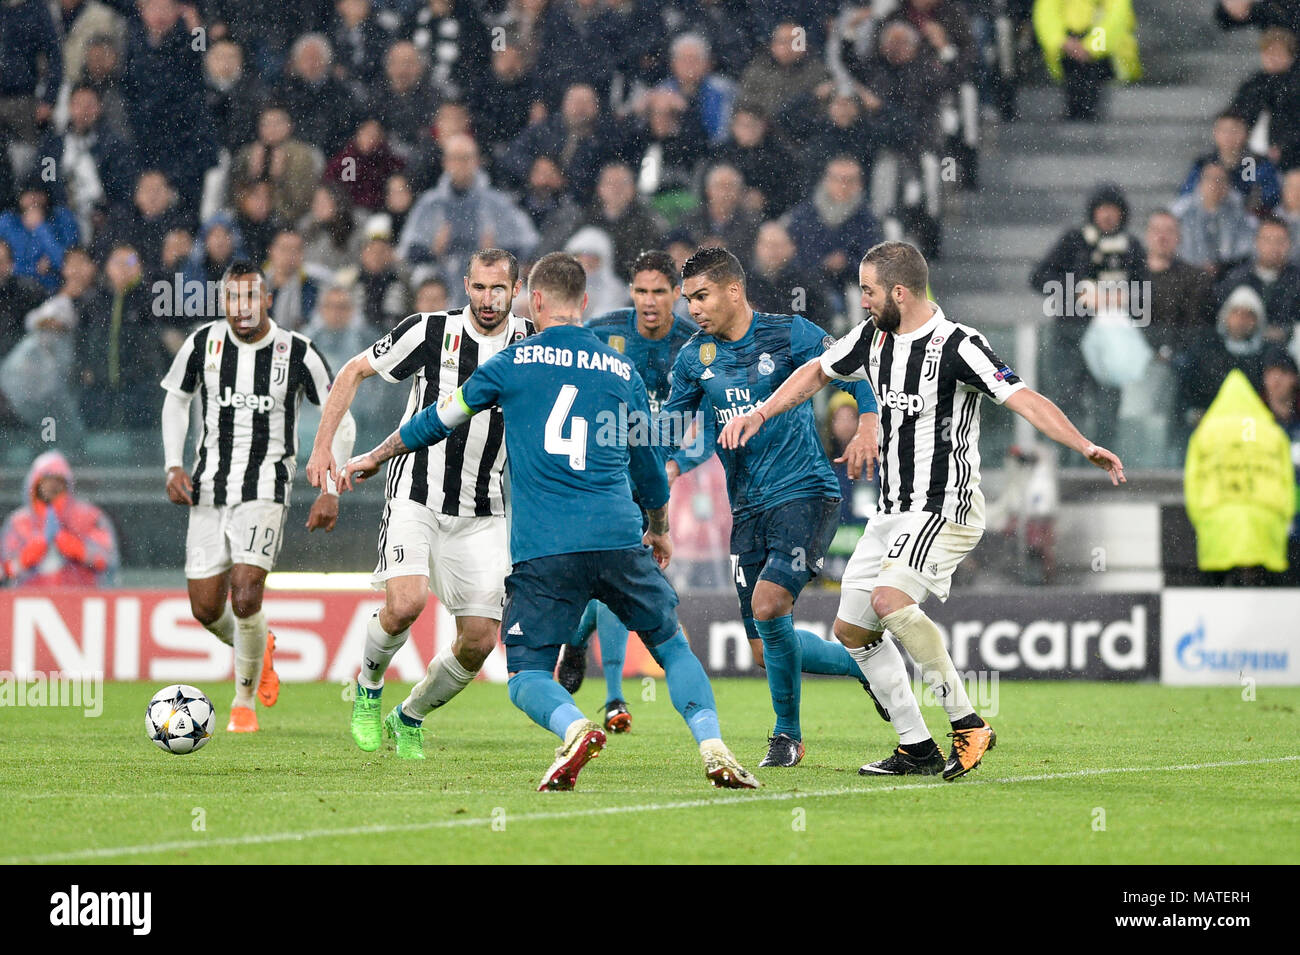 Real Madrid Player Sergio Ramos Stock Photos Amp Real Madrid